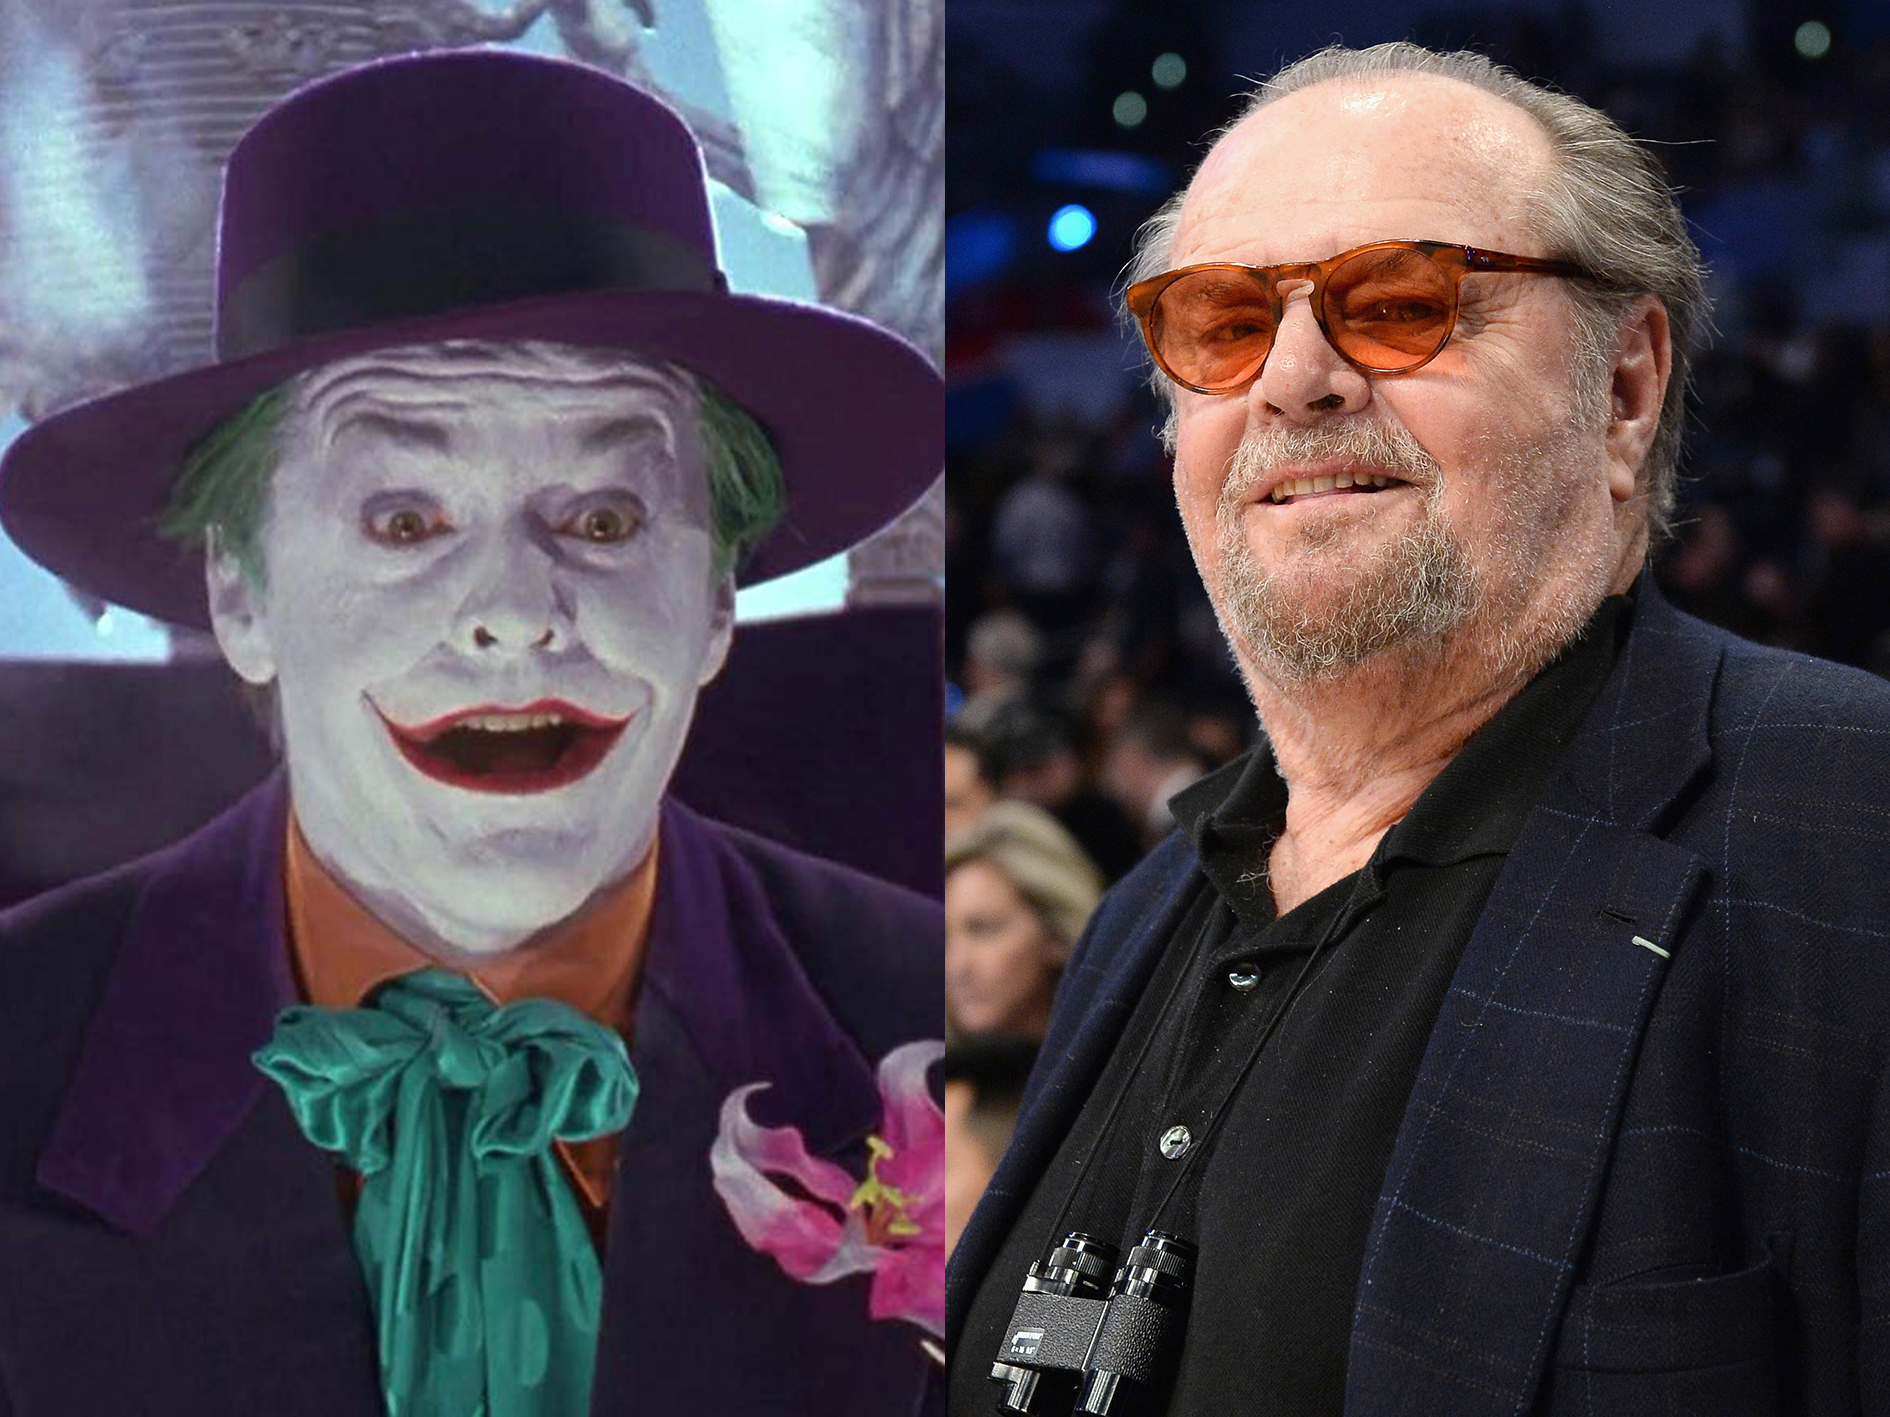 Batman Joker Jack Nicholson Where The Batman 1989 Cast Are Now